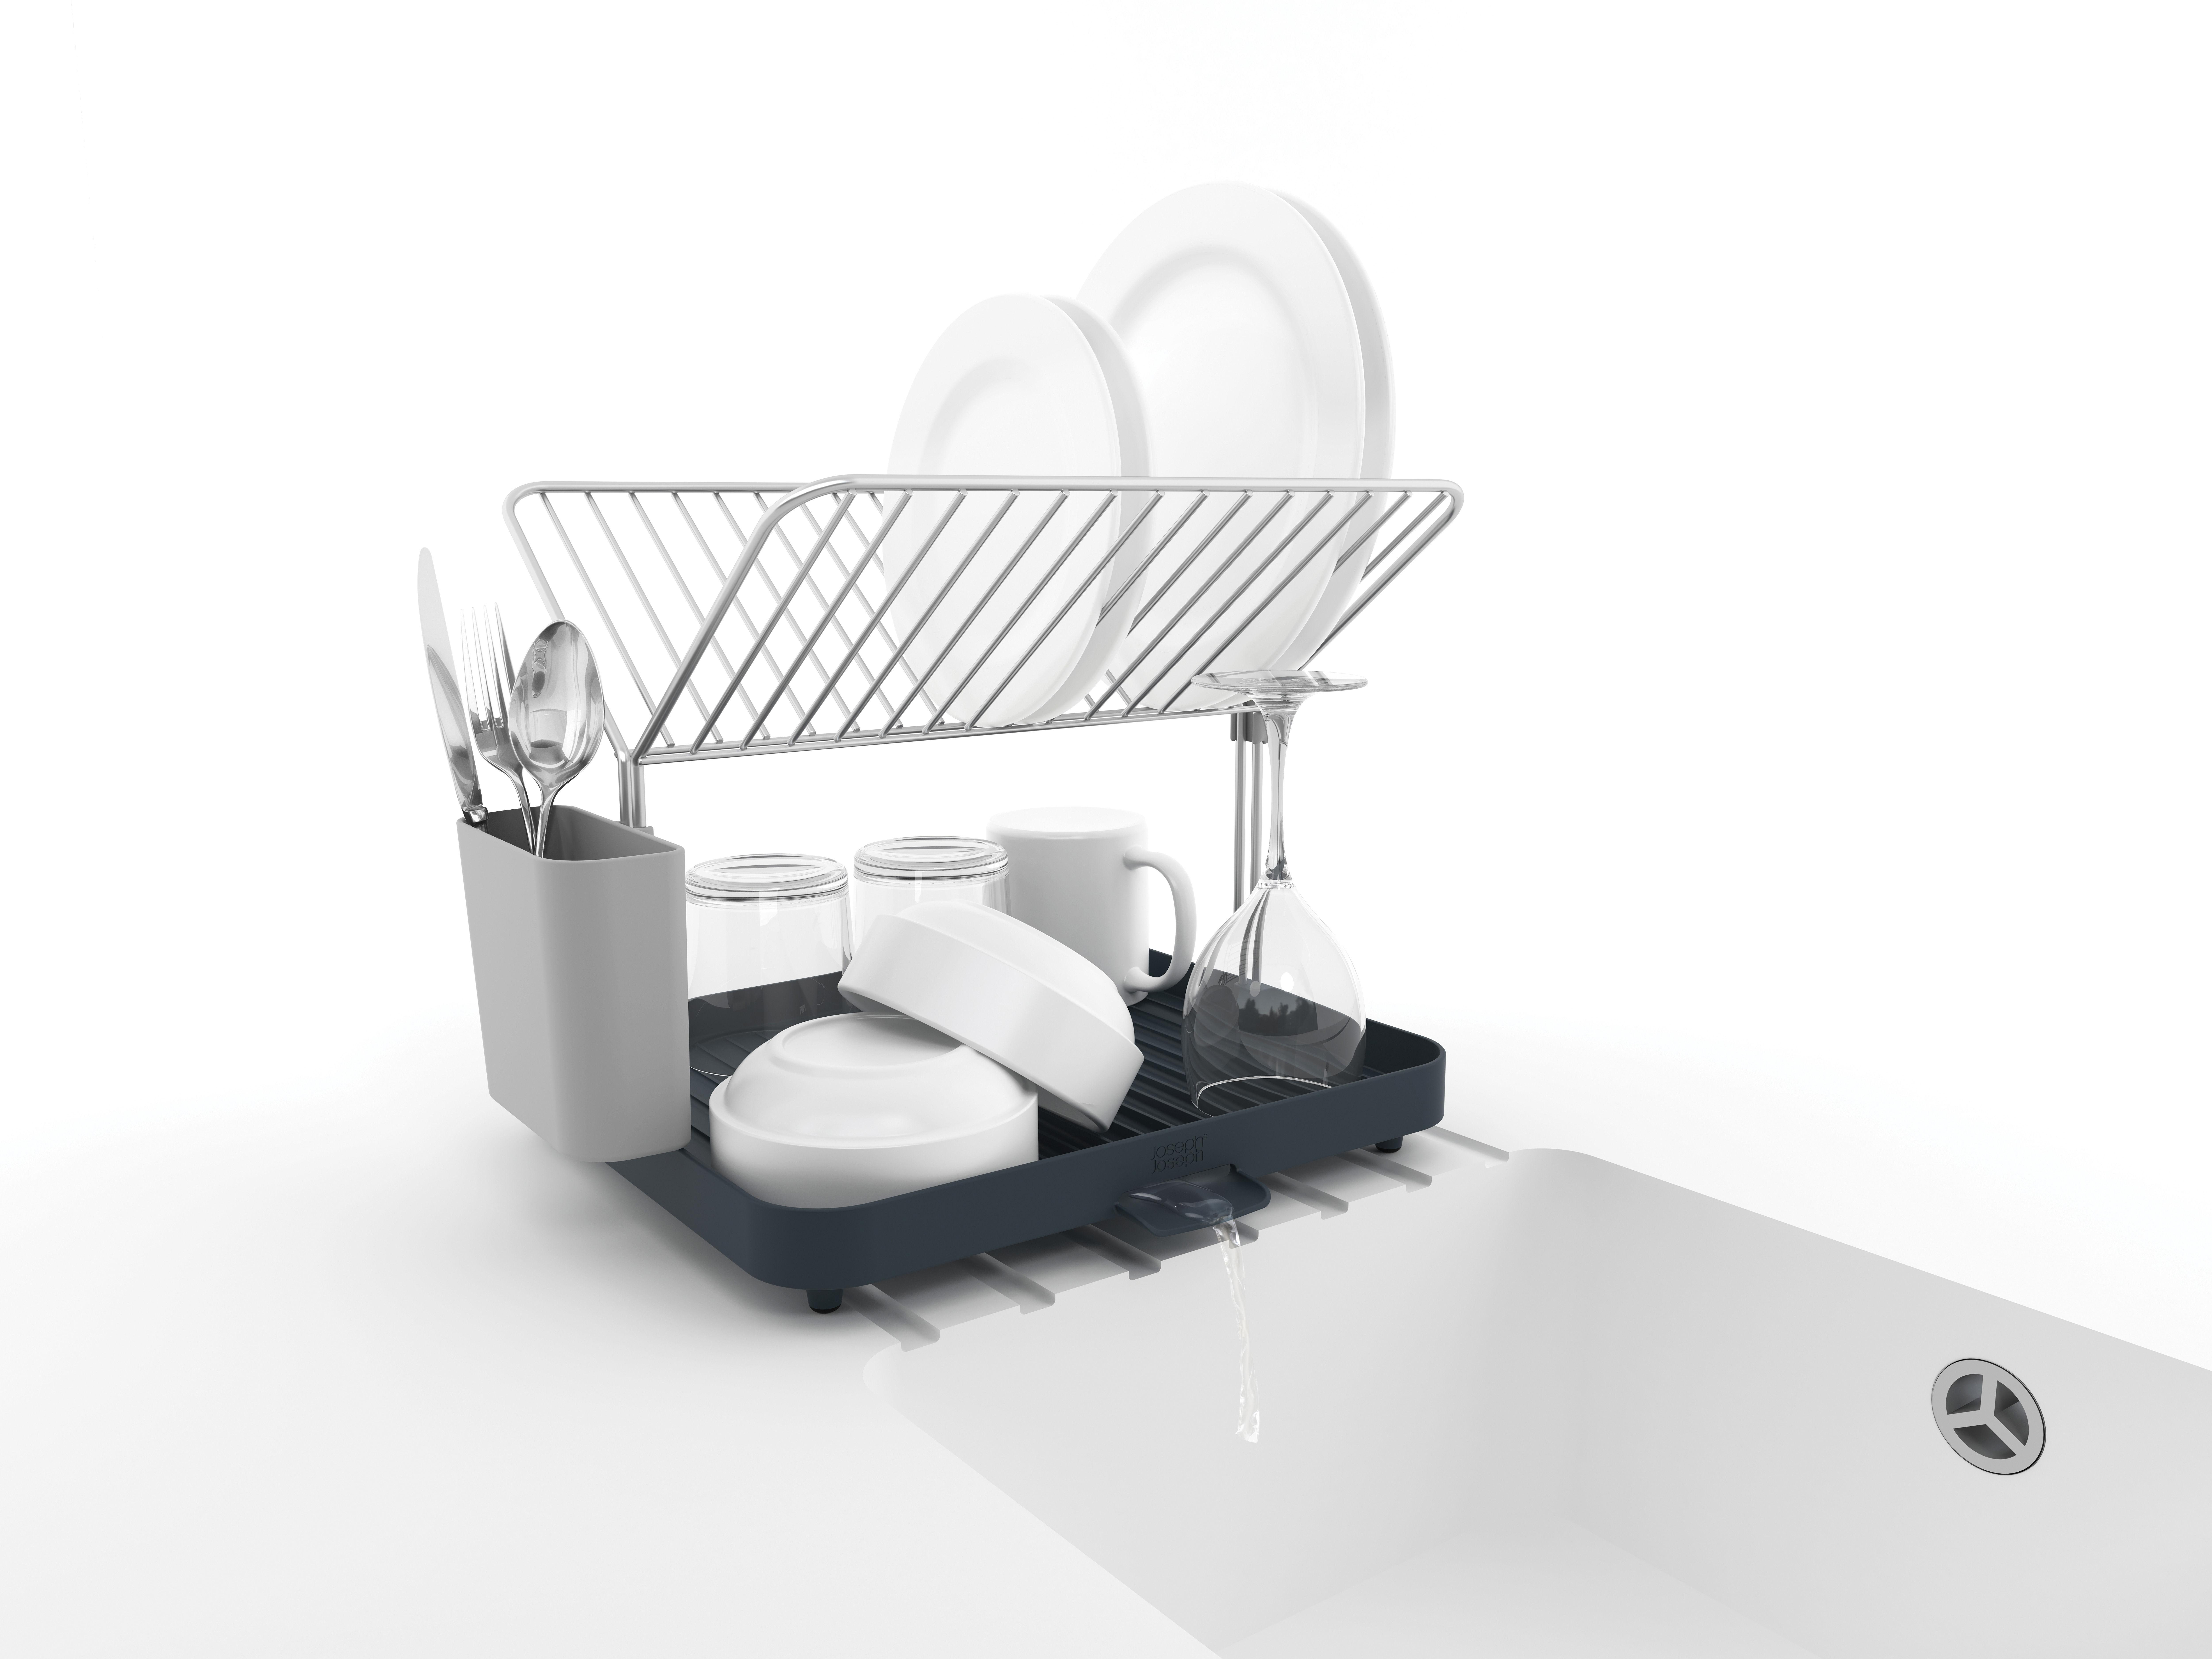 y rack abtropfgestell grau schwarz by joseph joseph made in design. Black Bedroom Furniture Sets. Home Design Ideas